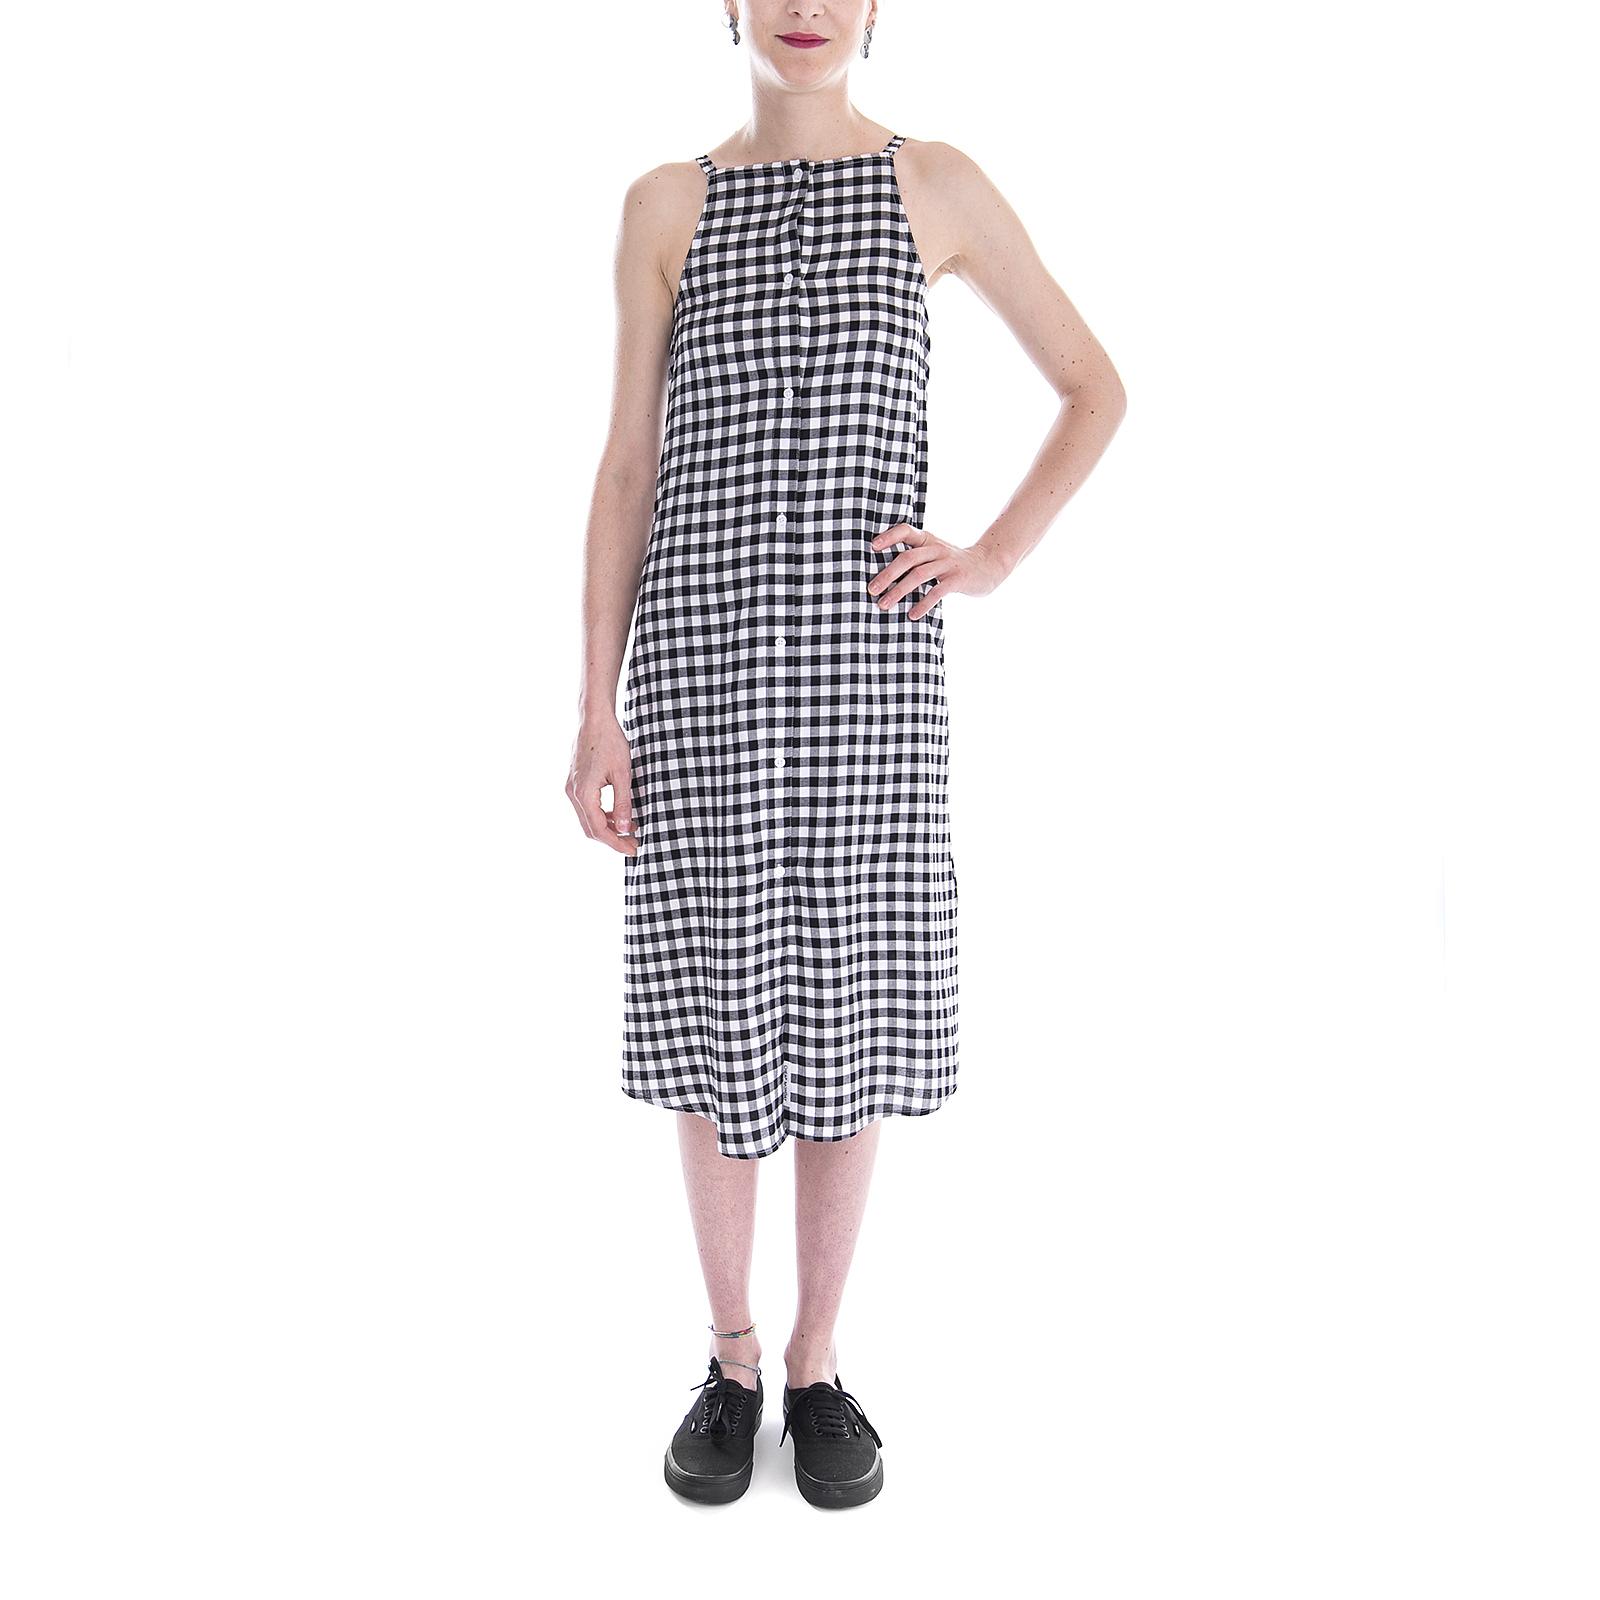 Nero Dress Nero Check Vestiti Track Gingham Monday Cheap qYSt0xff